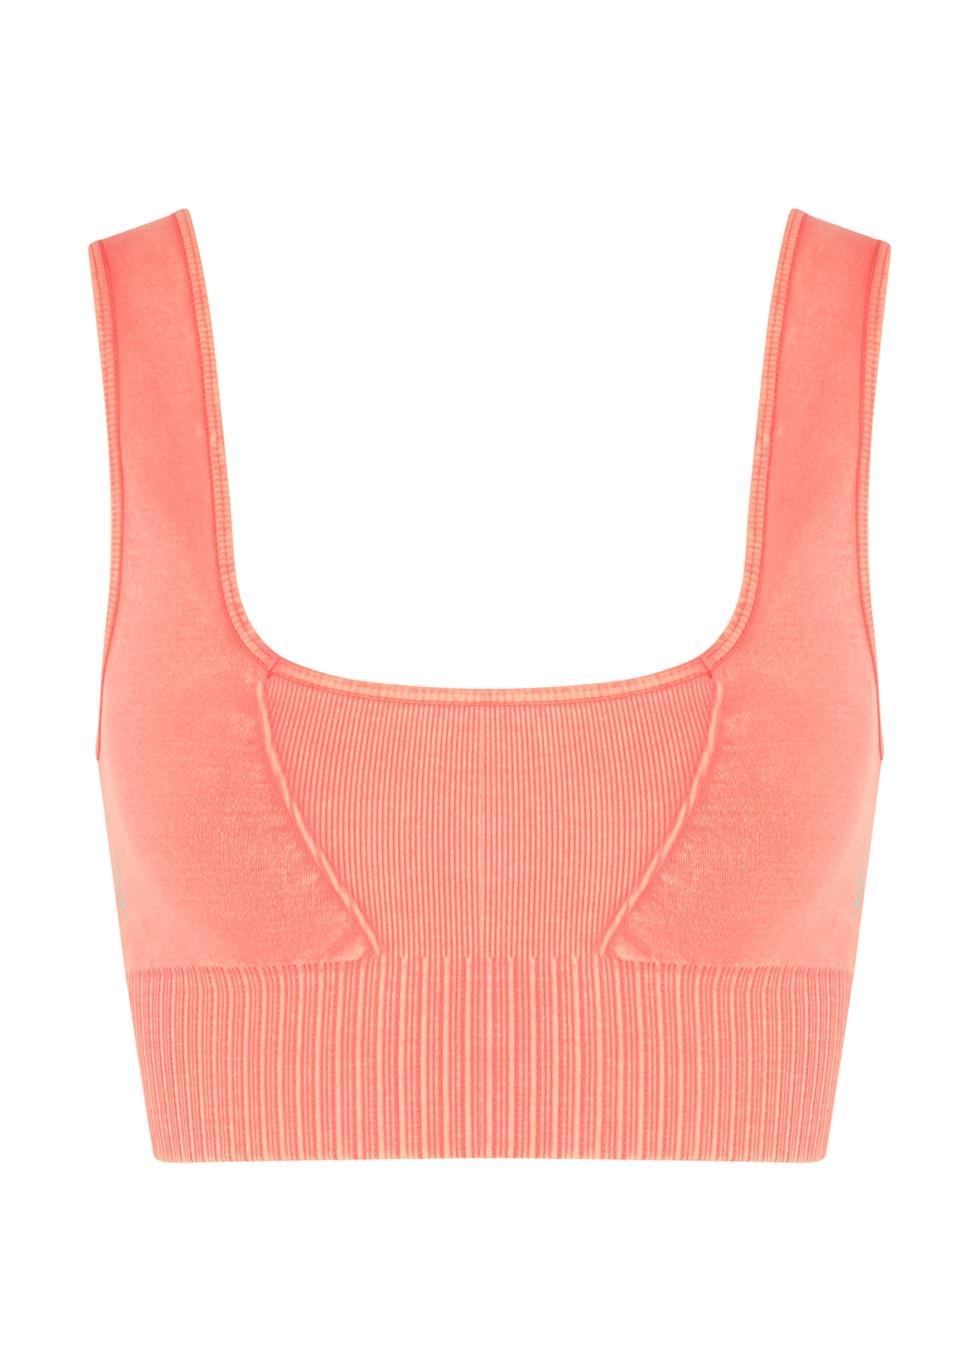 Good Karma peach stretch-jersey bra top